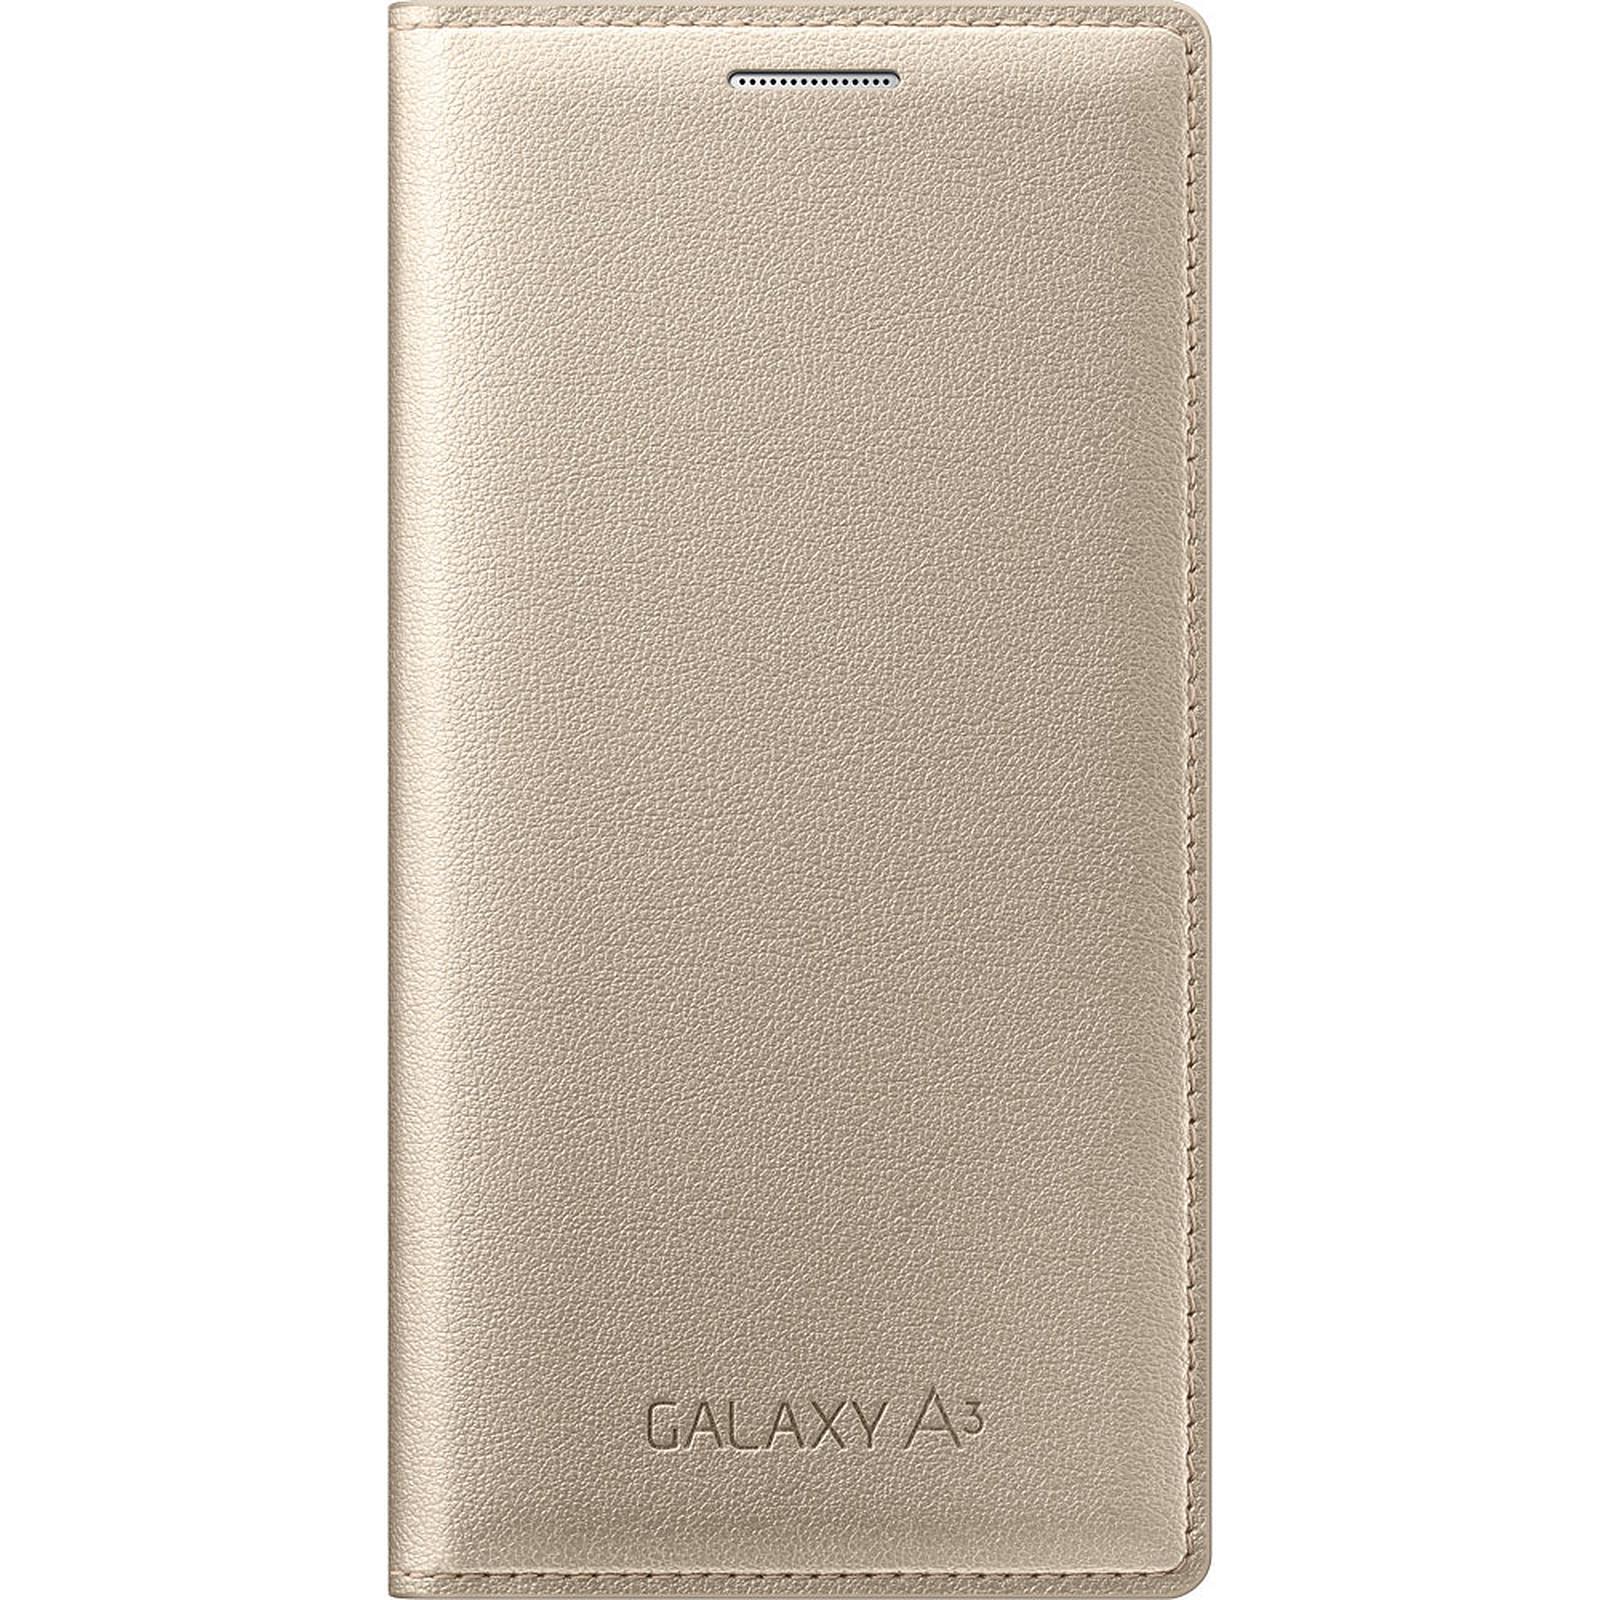 Samsung Flip Wallet Or Samsung Galaxy A3 2016